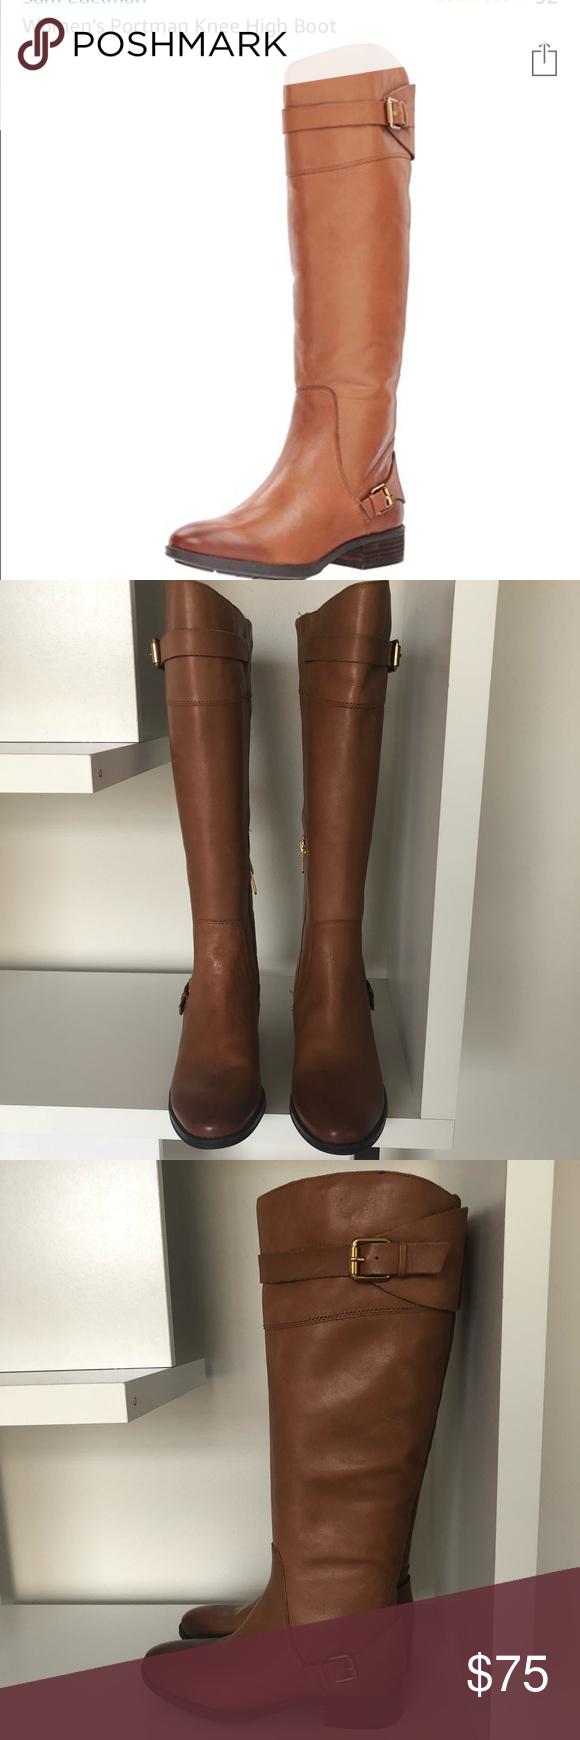 ba388271808fc Sam Edelman Portman Knee high boots Size 6.5 Brand New Equestrian style Sam  Edelman Portman boots ...